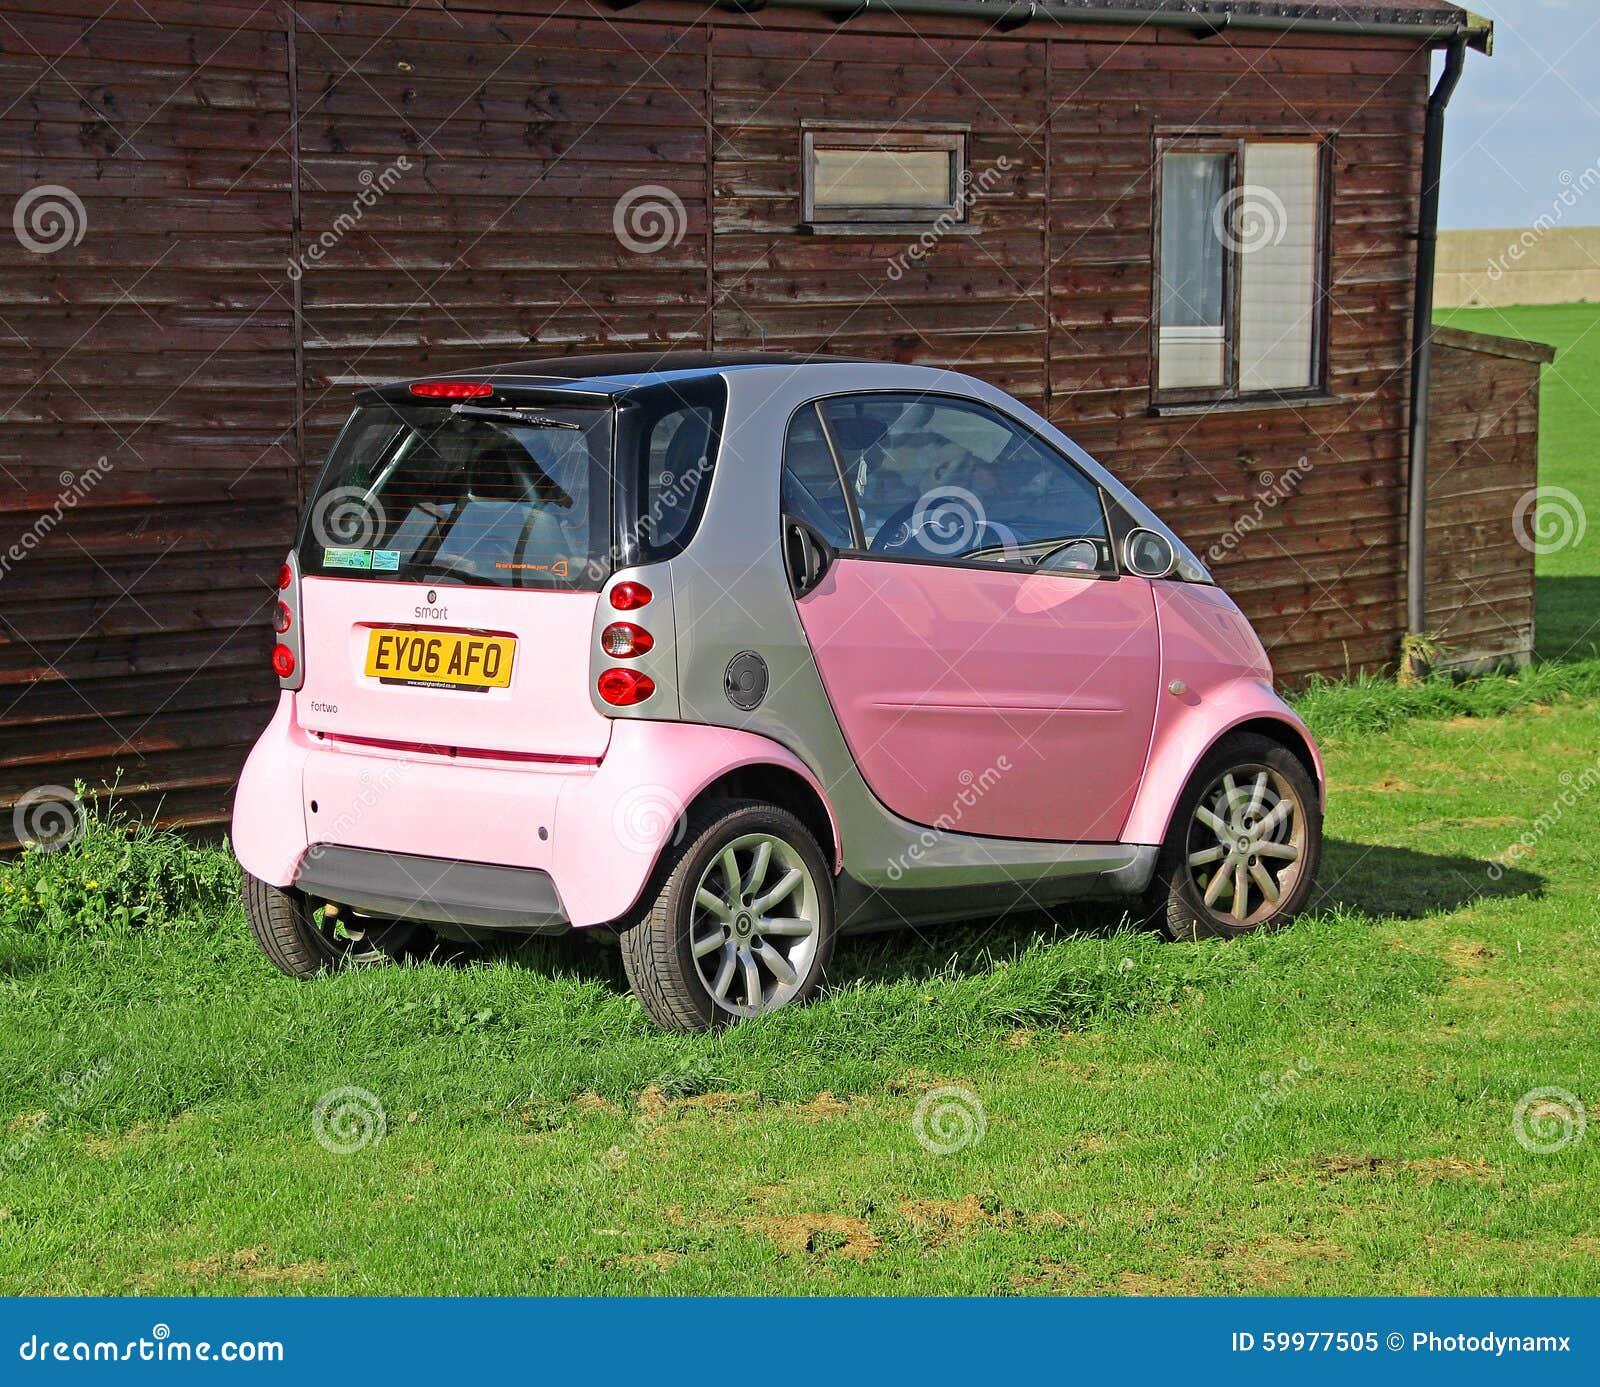 Pink Smartcar Bobbydaleearnhardt.com